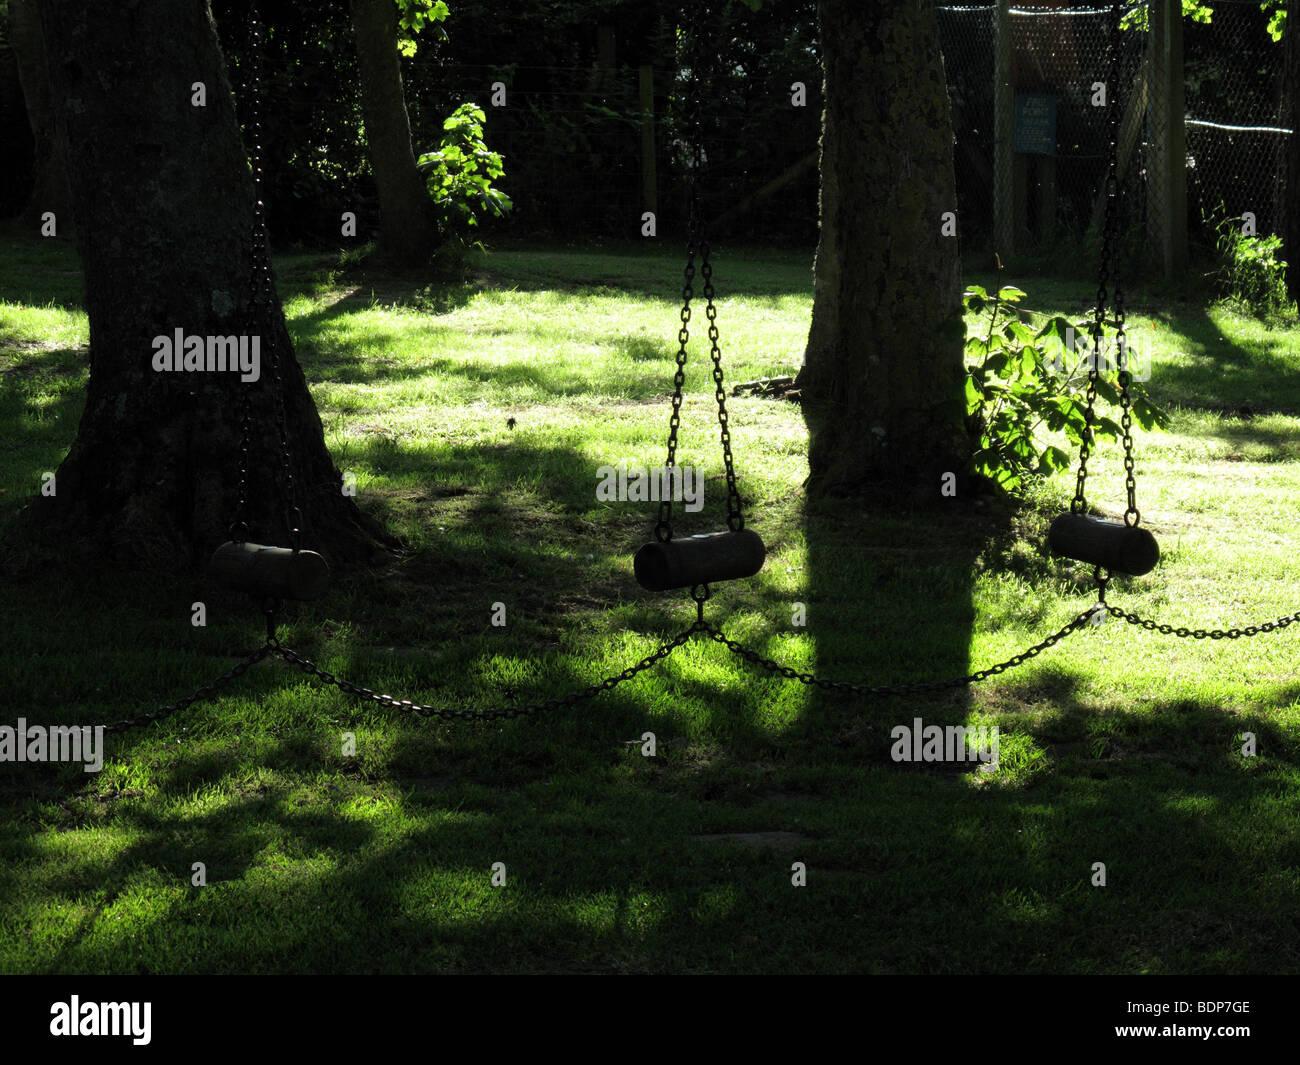 Playground swings - Stock Image